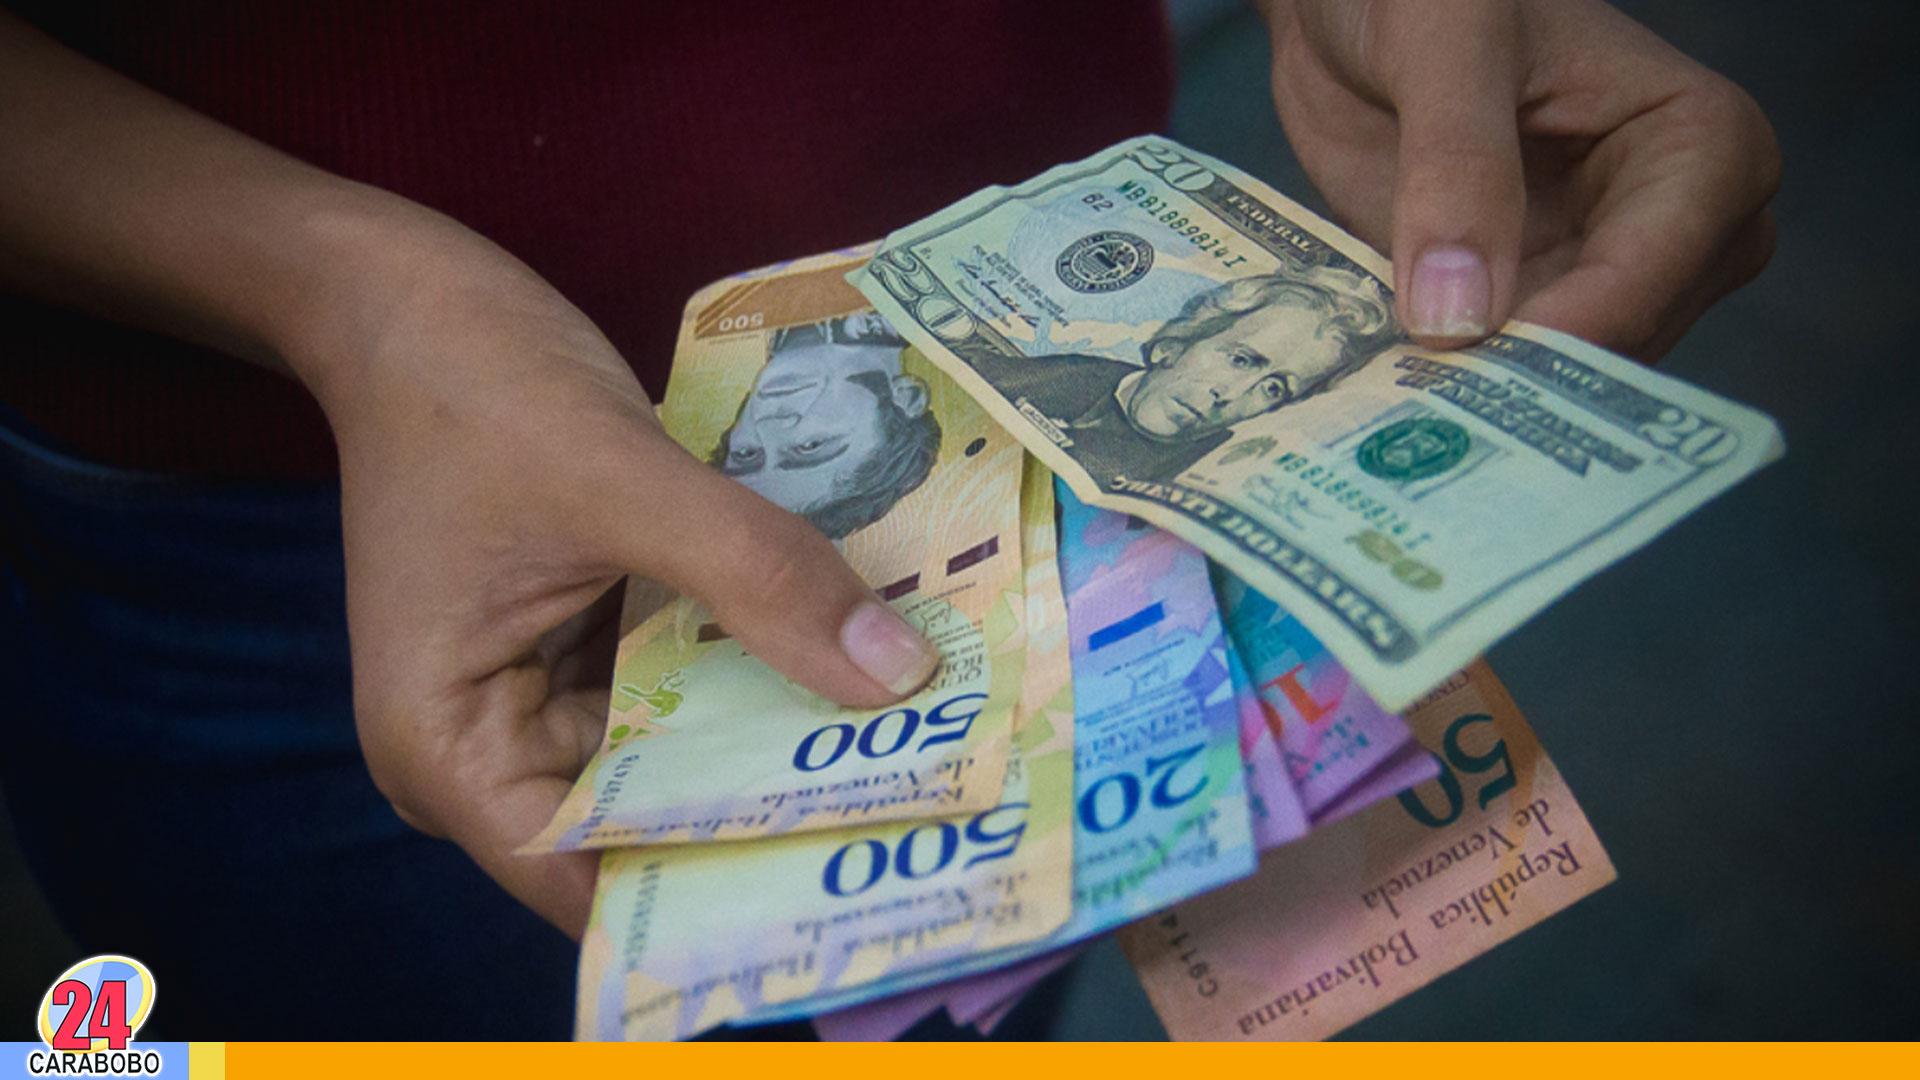 dólares en la ciudad - dólares en la ciudad